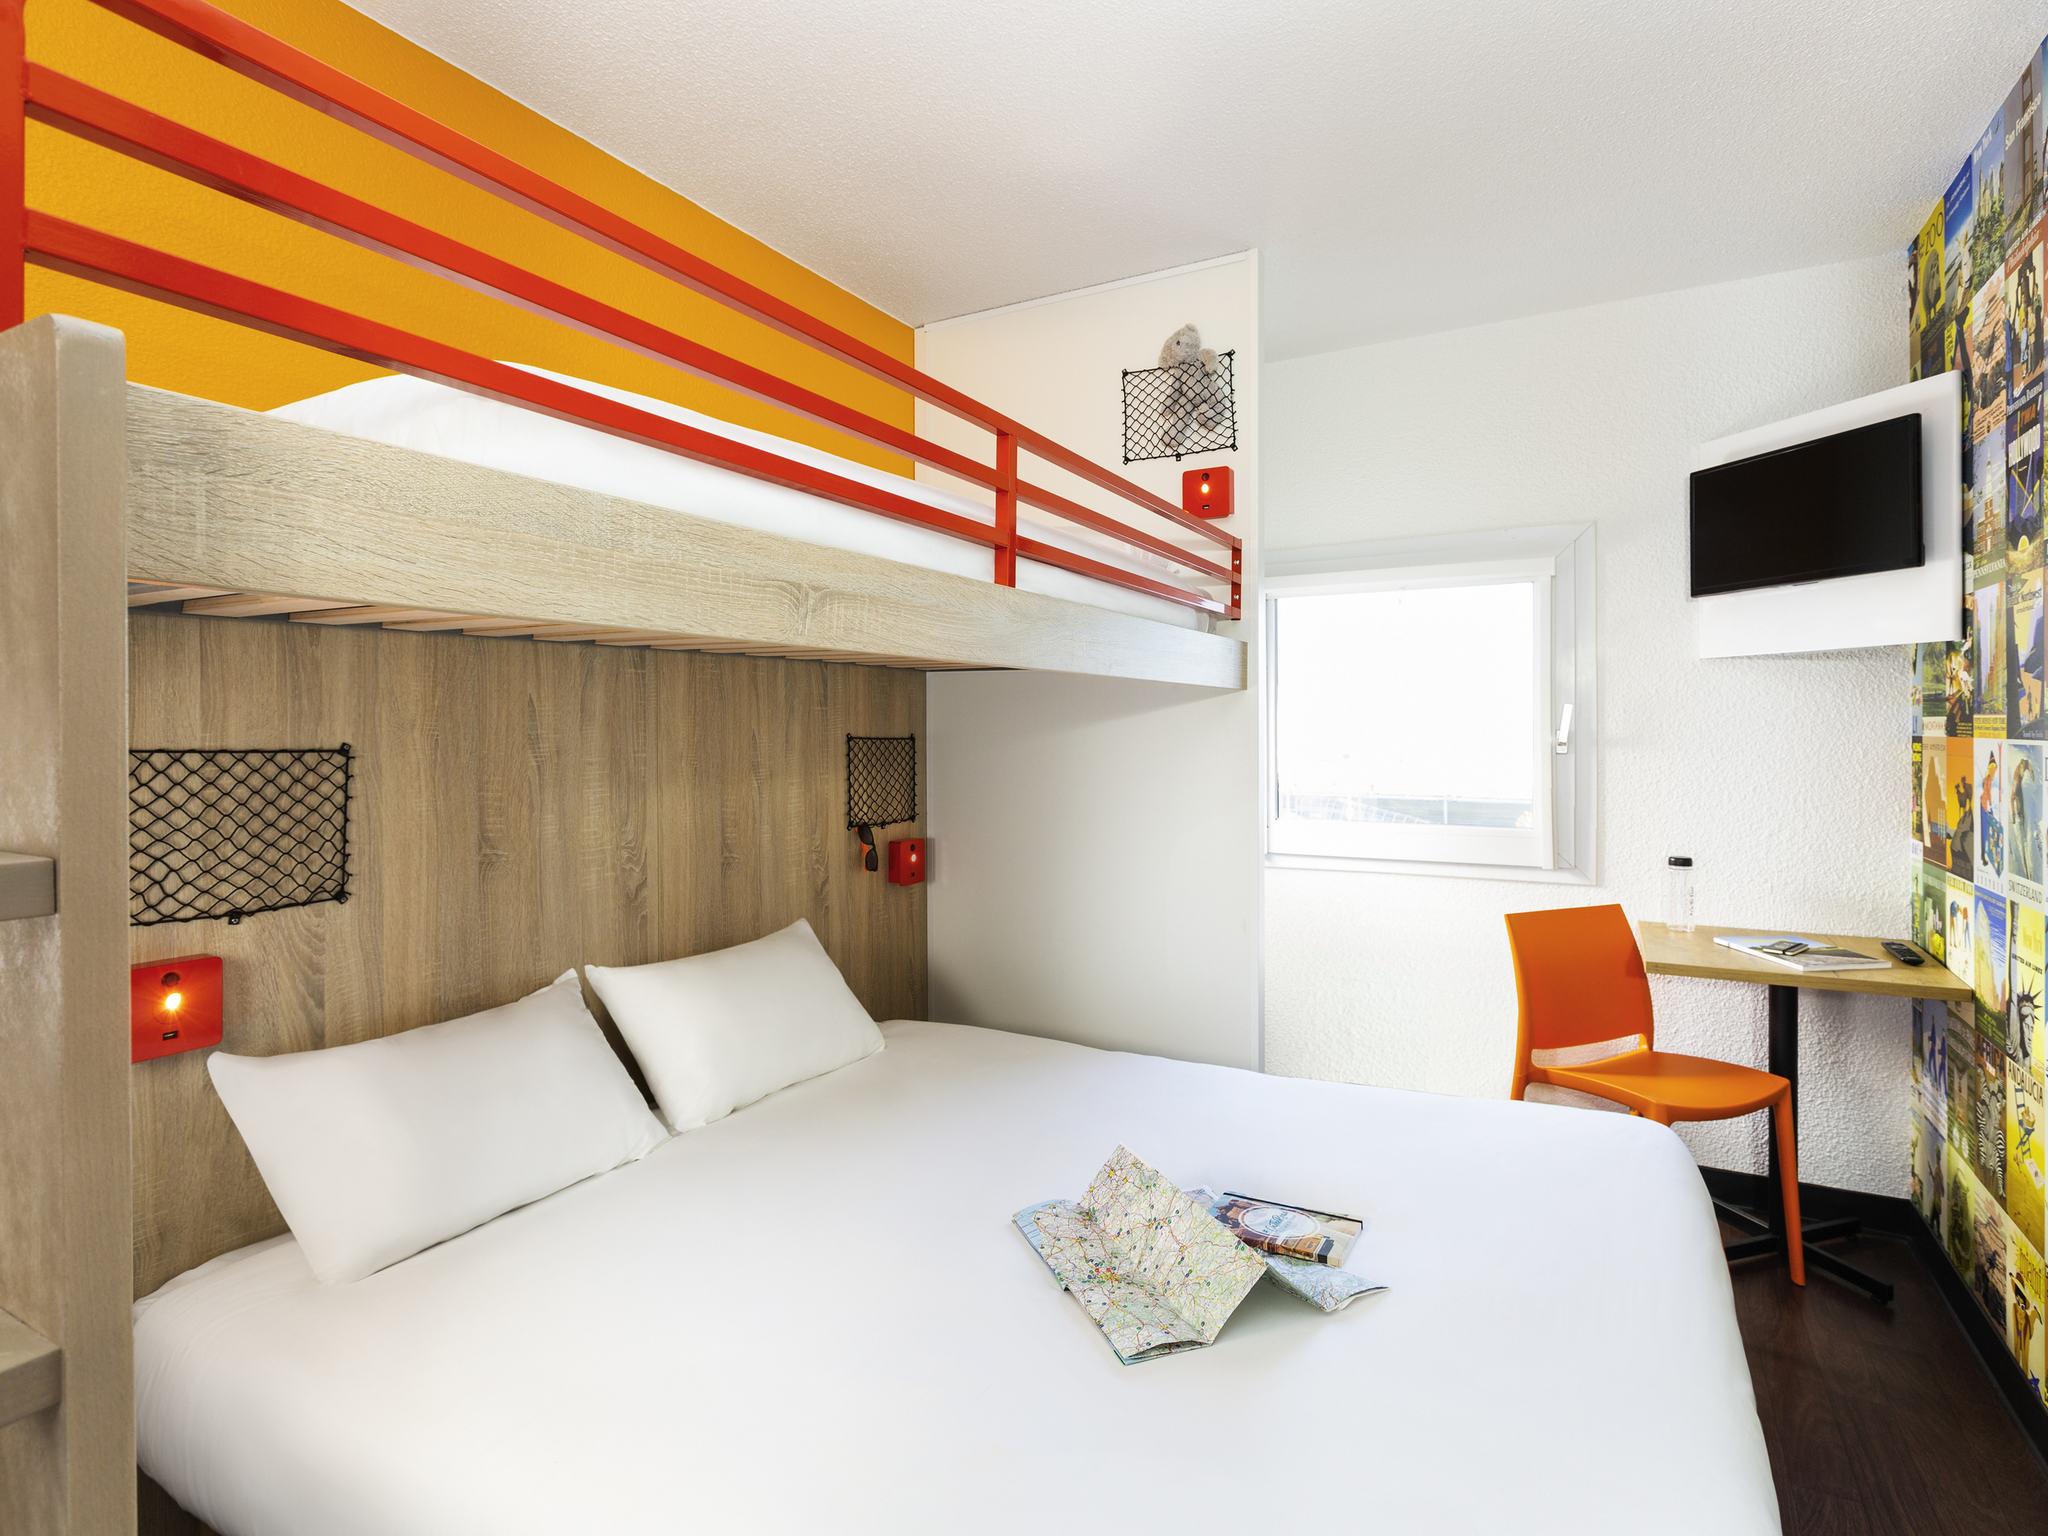 Hôtel - hotelF1 Saint-Malo